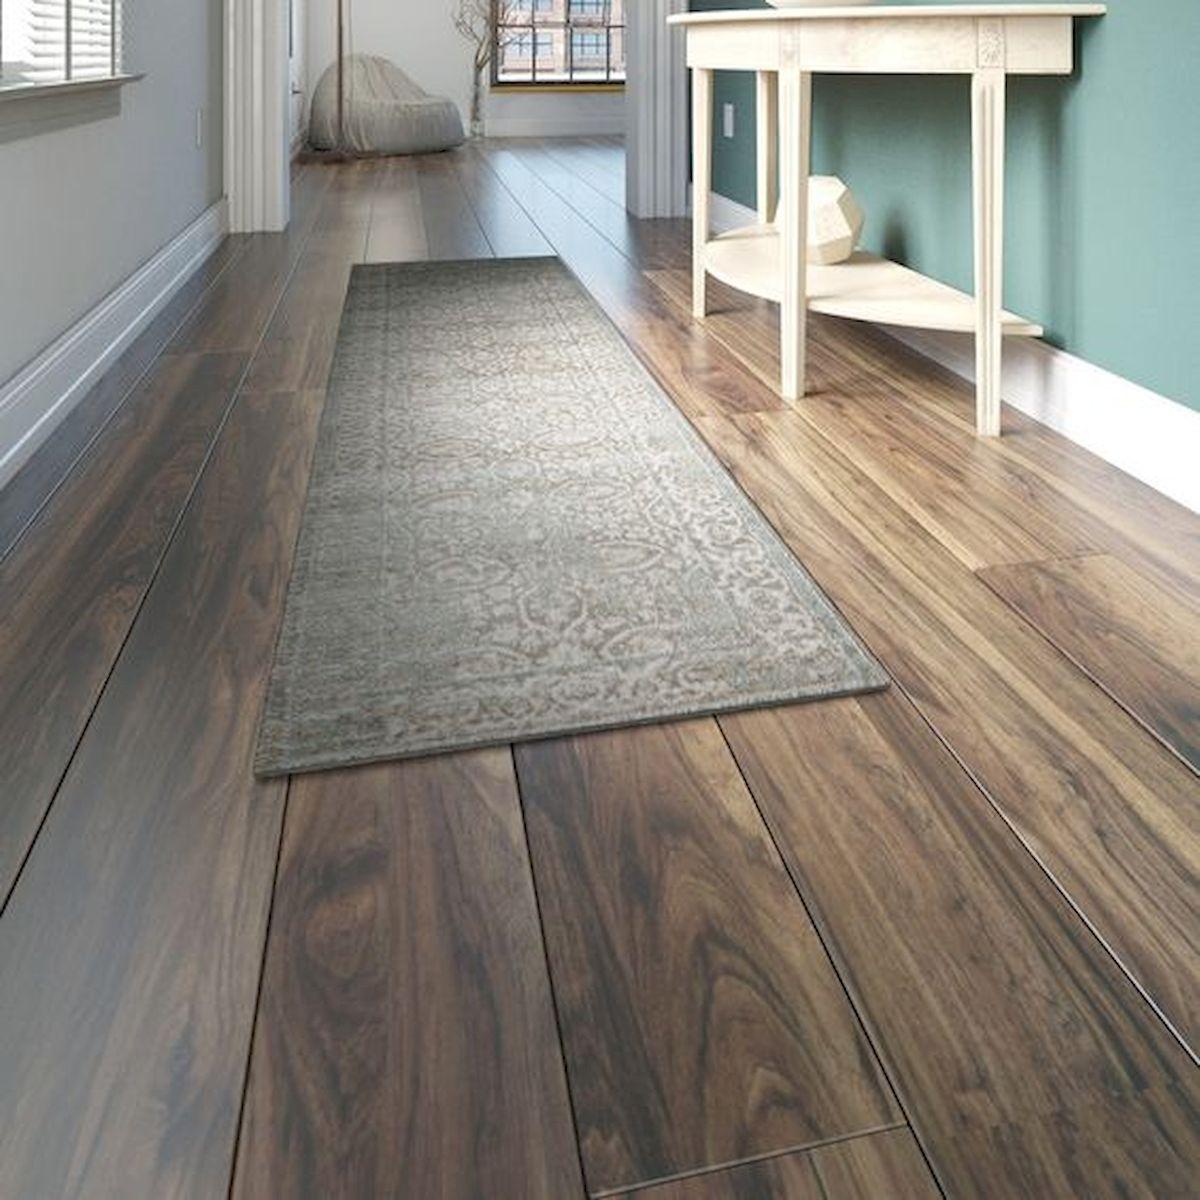 80 Gorgeous Hardwood Floor Ideas for Interior Home (51)